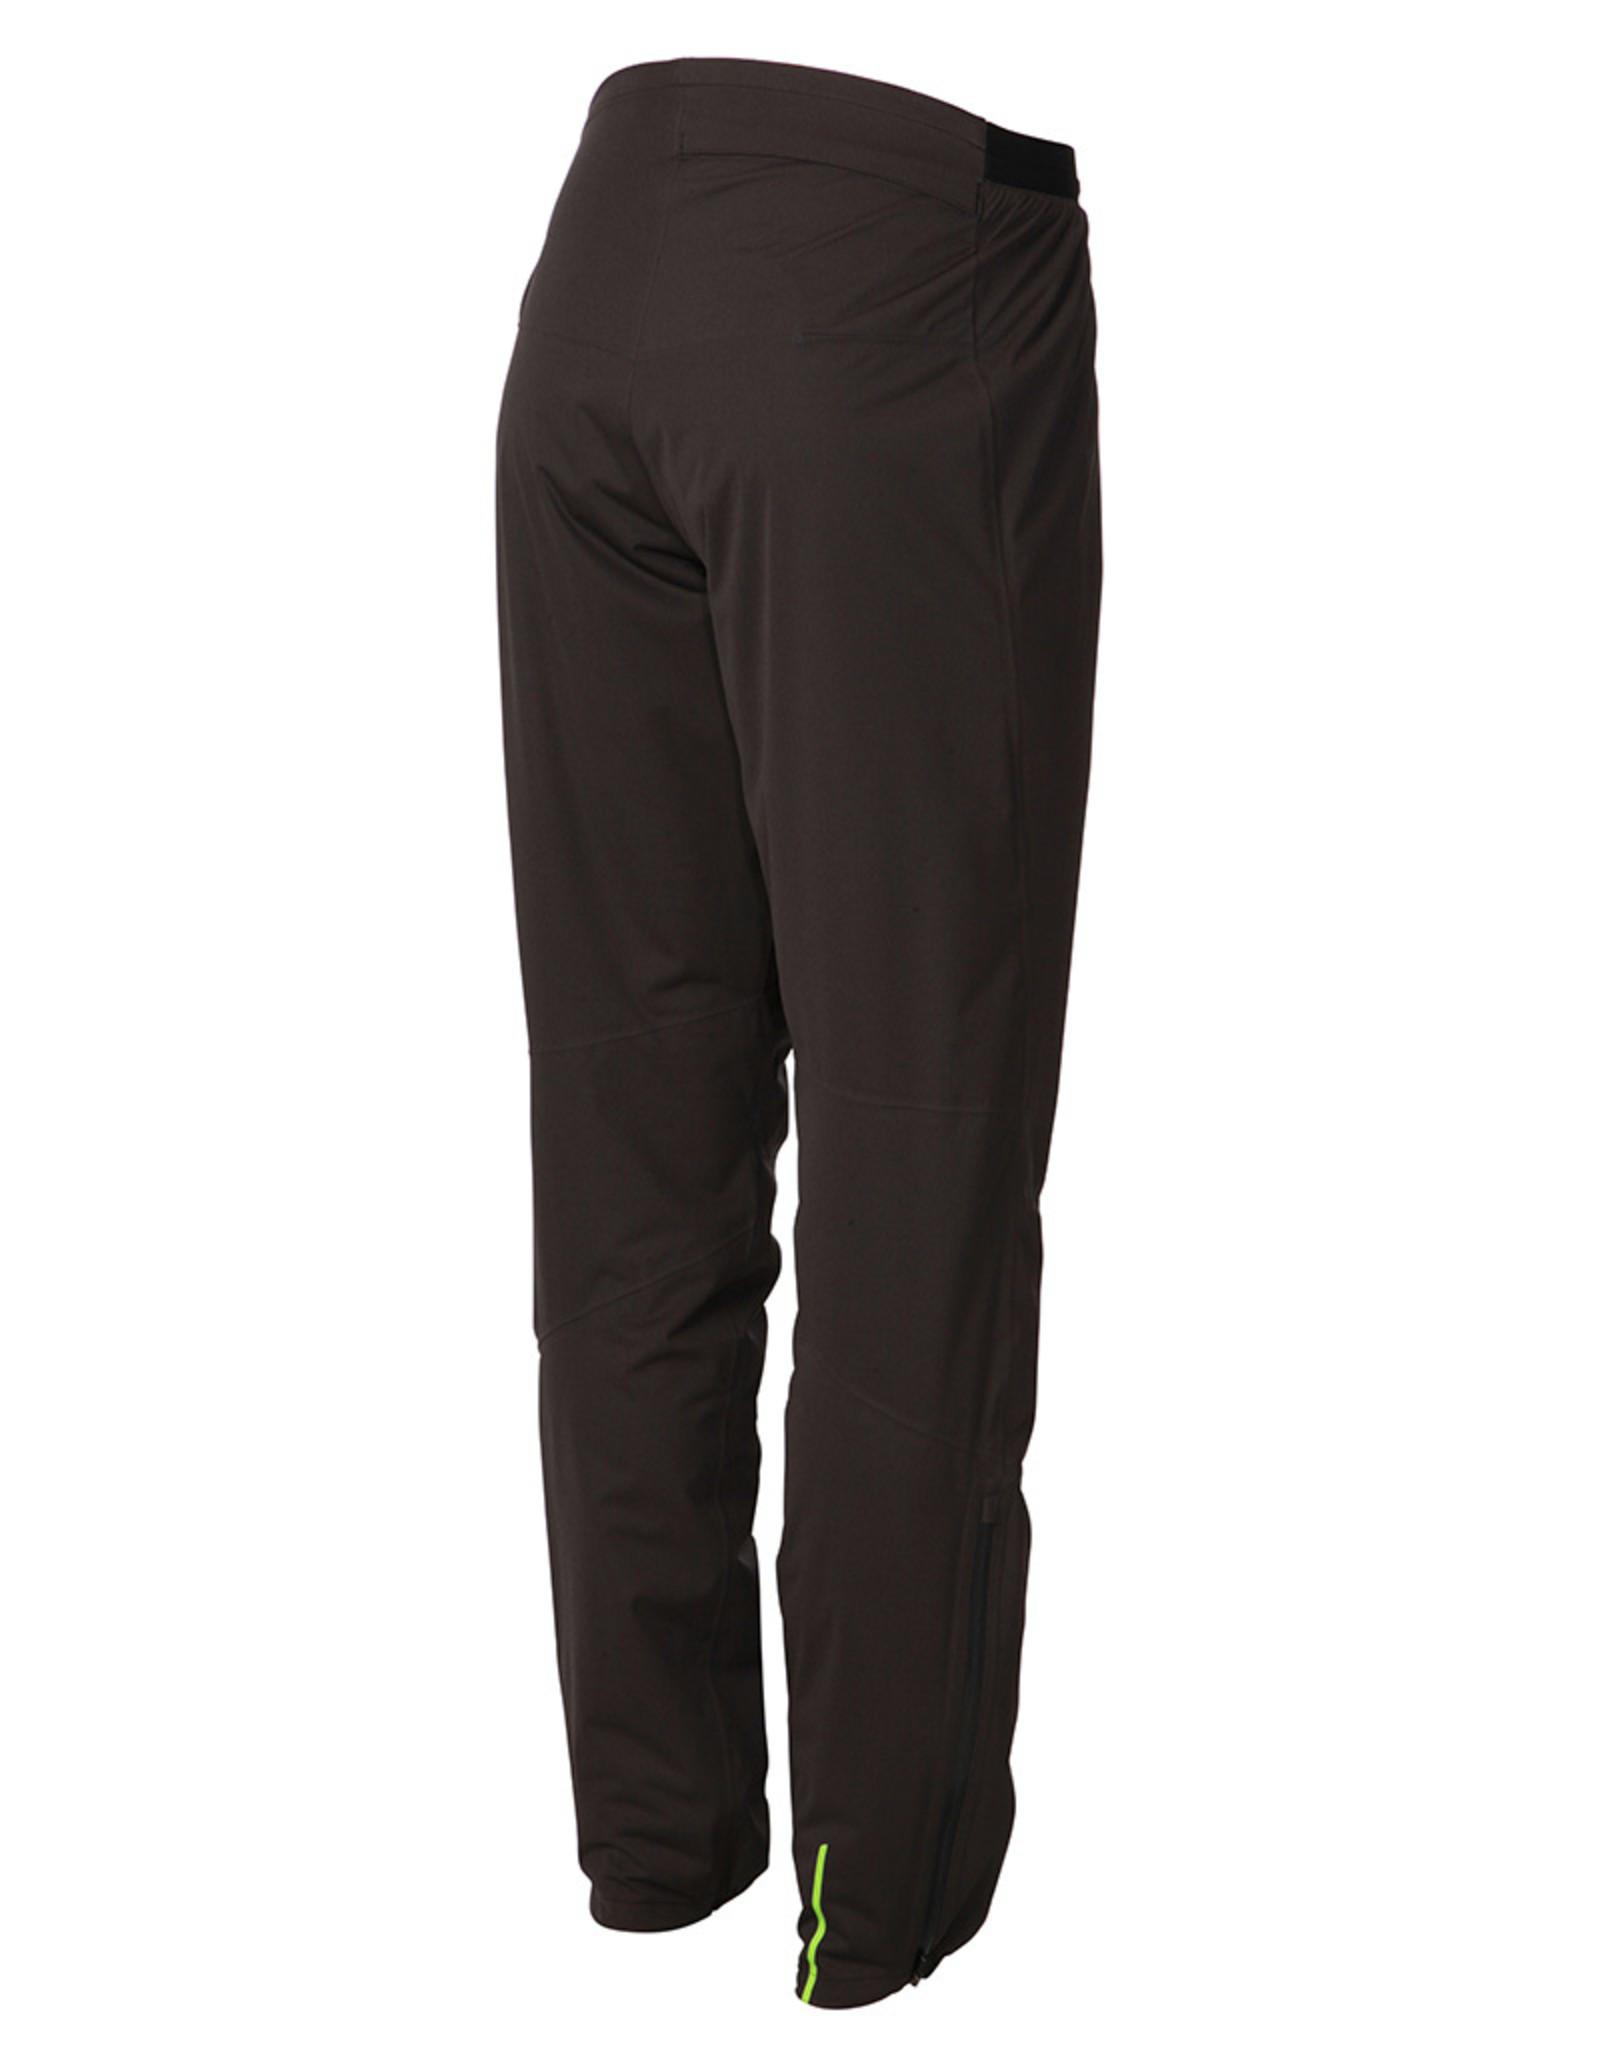 Inov-8 Trailpant Pantalon Impermeable - Noir